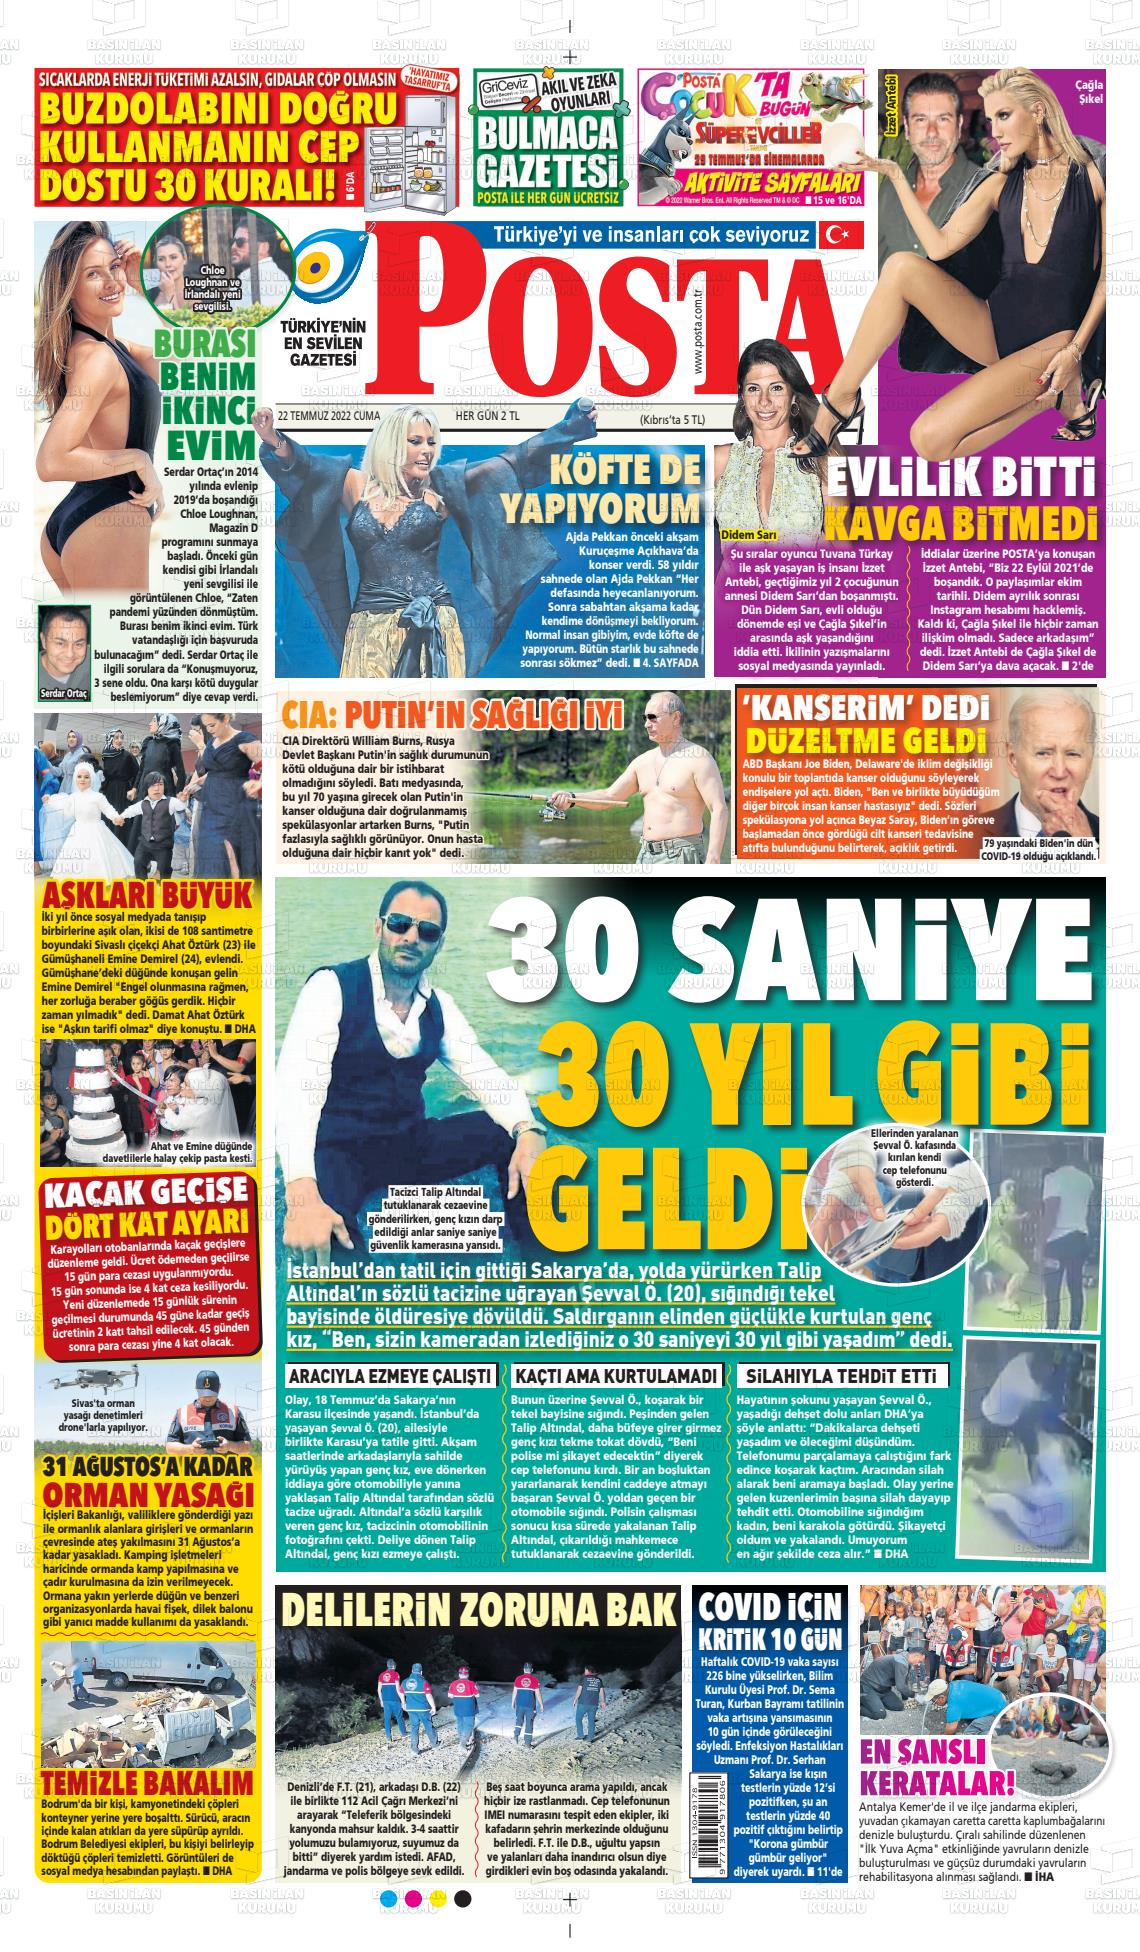 25 Ocak 2020, Cumartesi posta Gazetesi